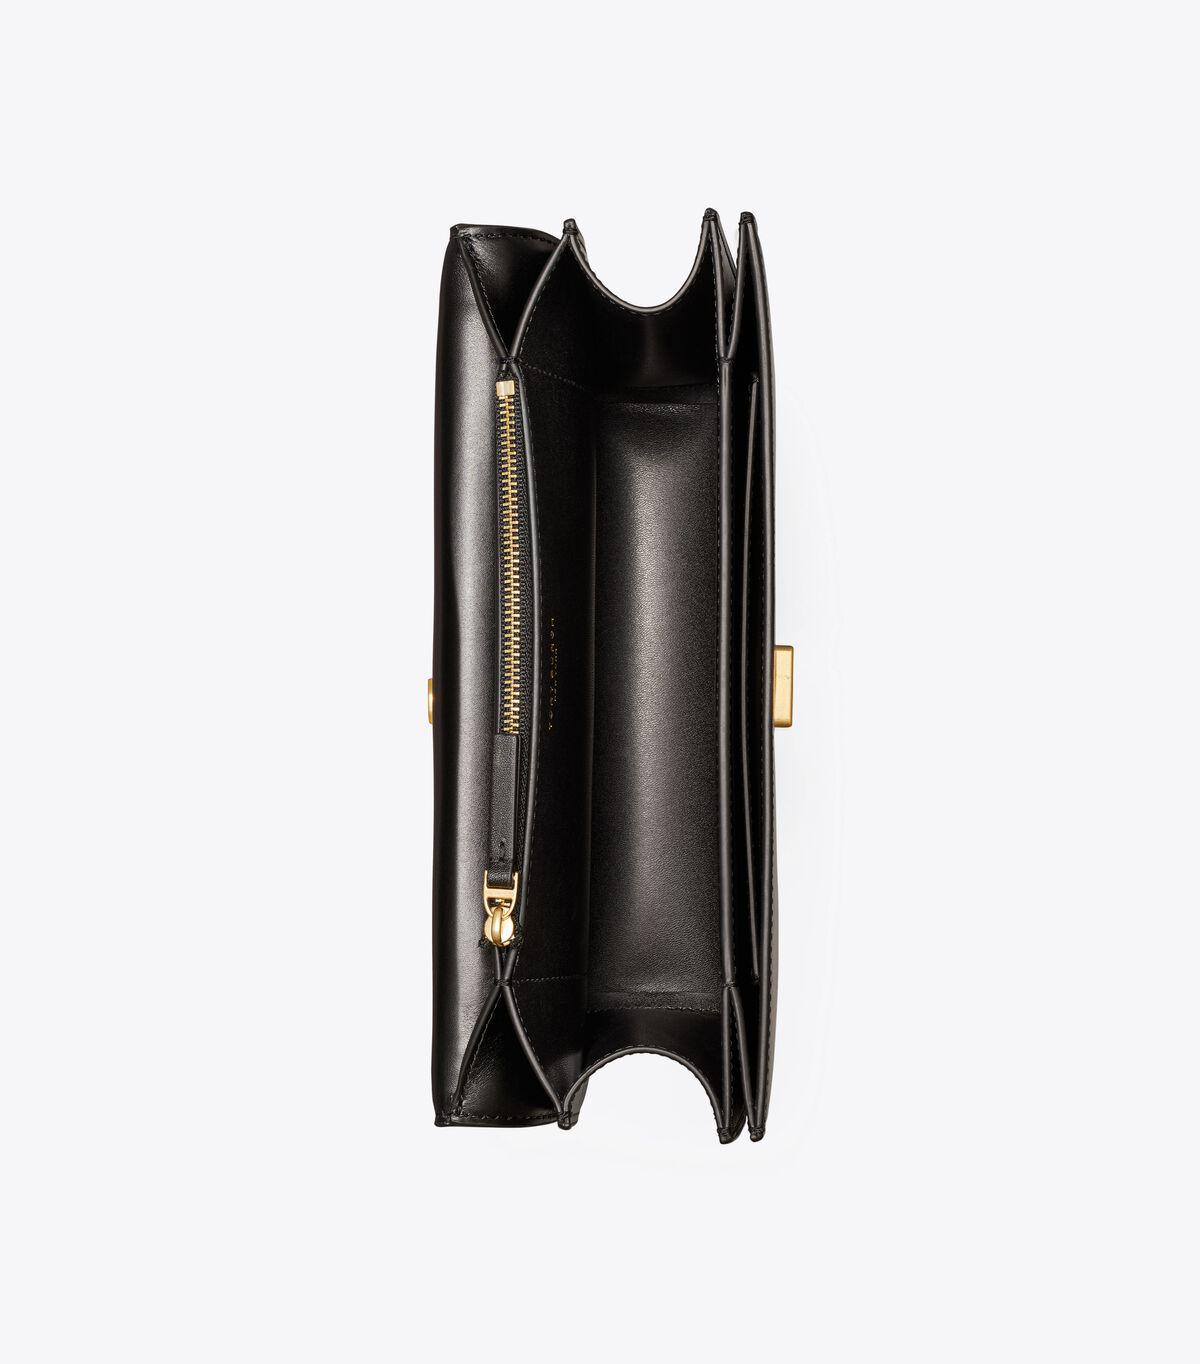 ELEANOR CANVAS CONVERTIBLE SHOULDER BAG